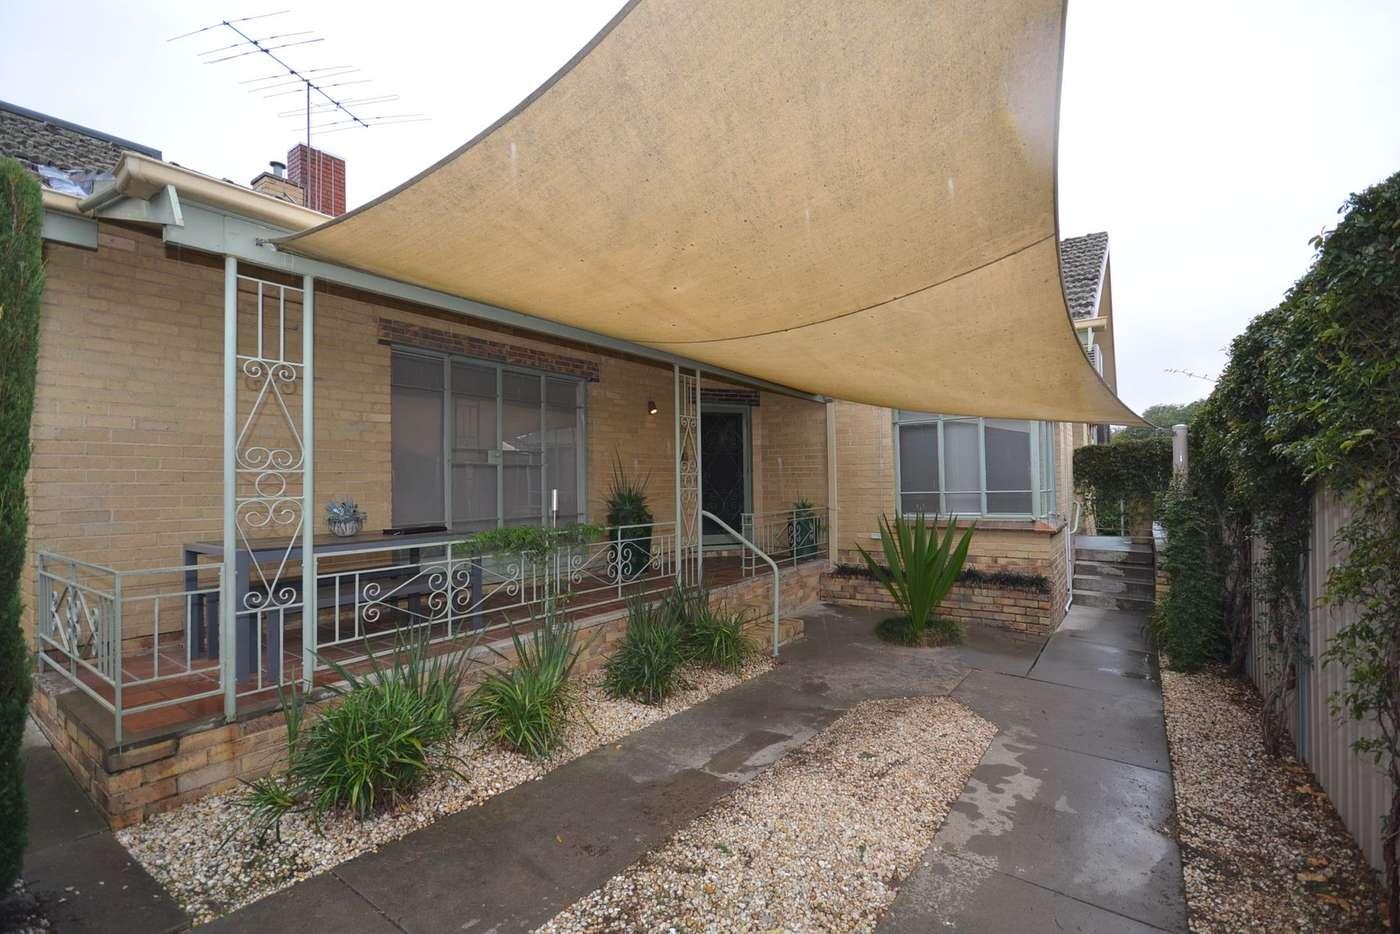 Main view of Homely house listing, 8 Waterloo Street, Bendigo VIC 3550